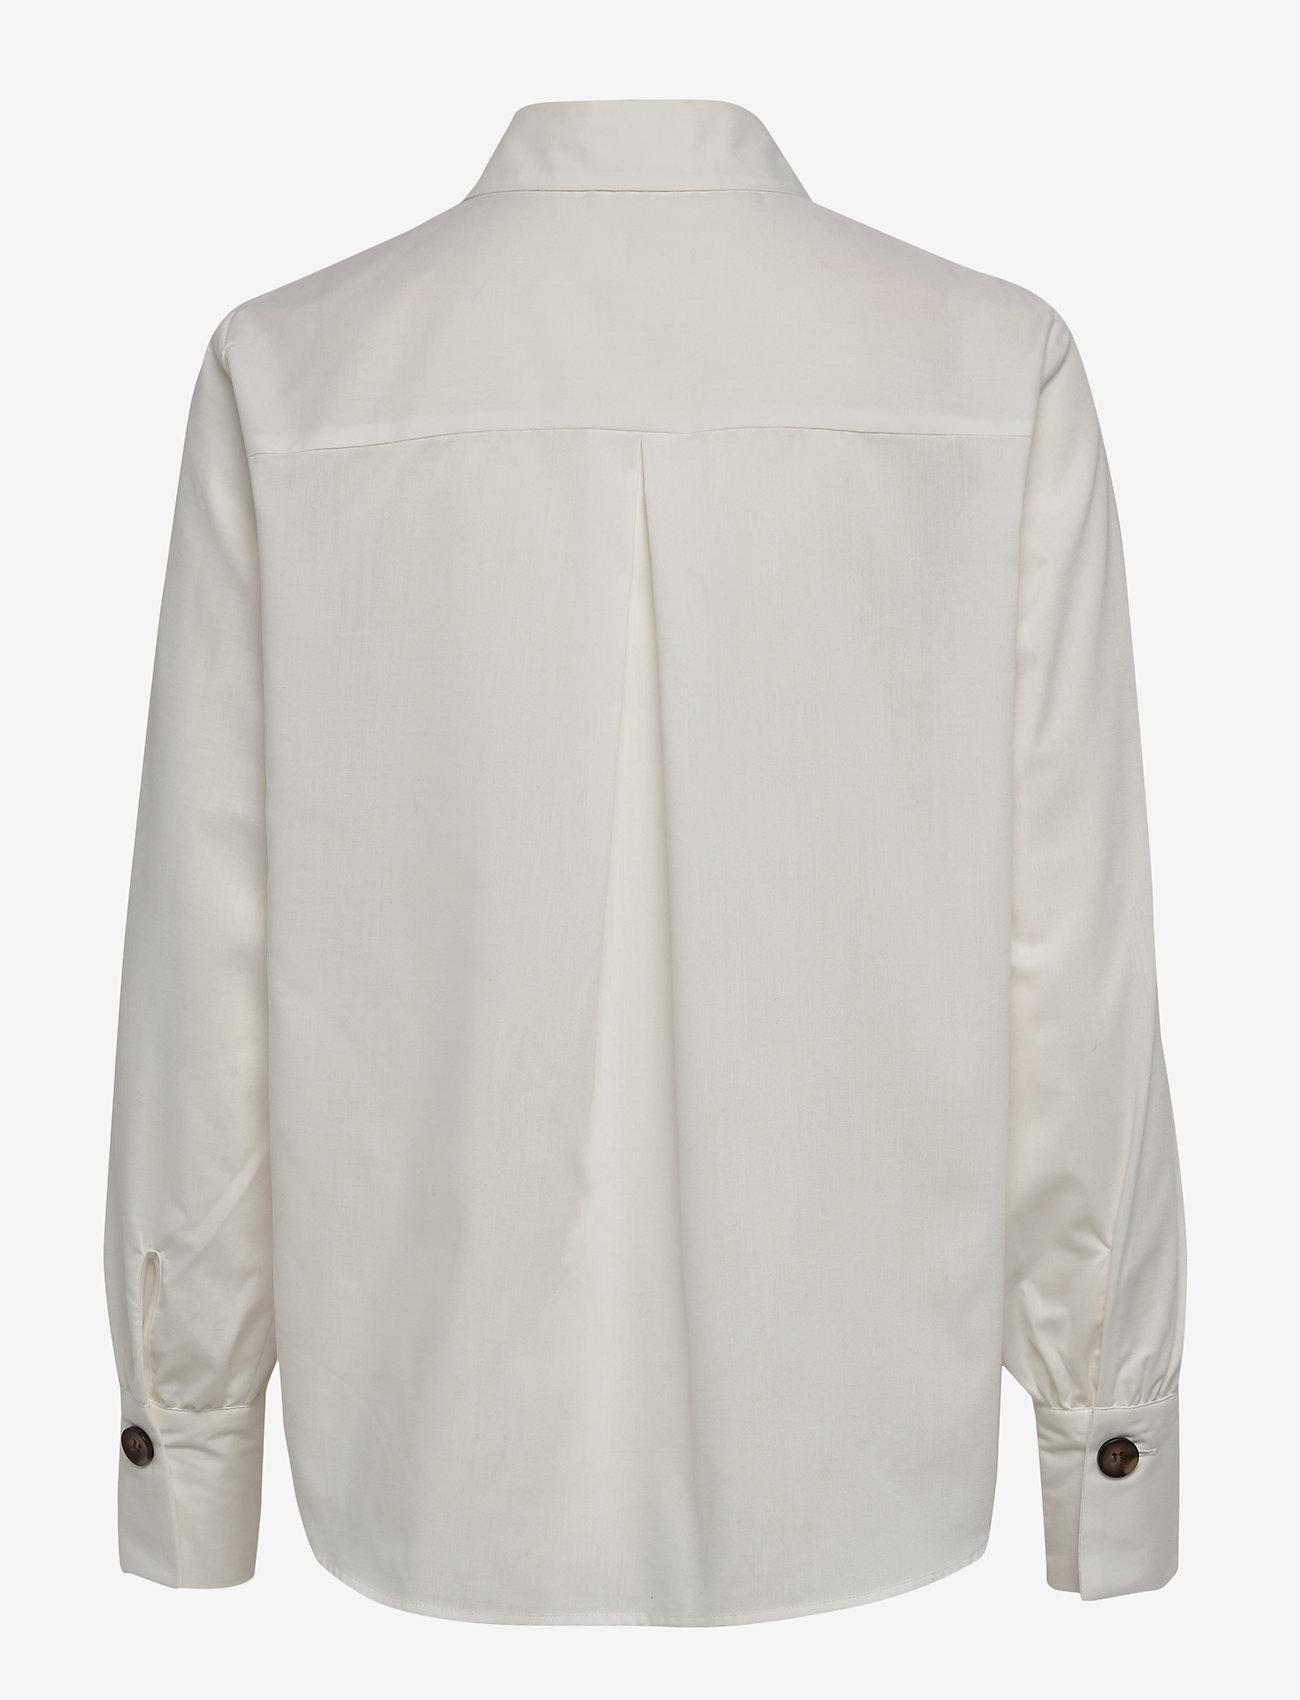 FREE/QUENT - FQFLYNN-SH - overhemden met lange mouwen - offwhite 11-4800 - 1